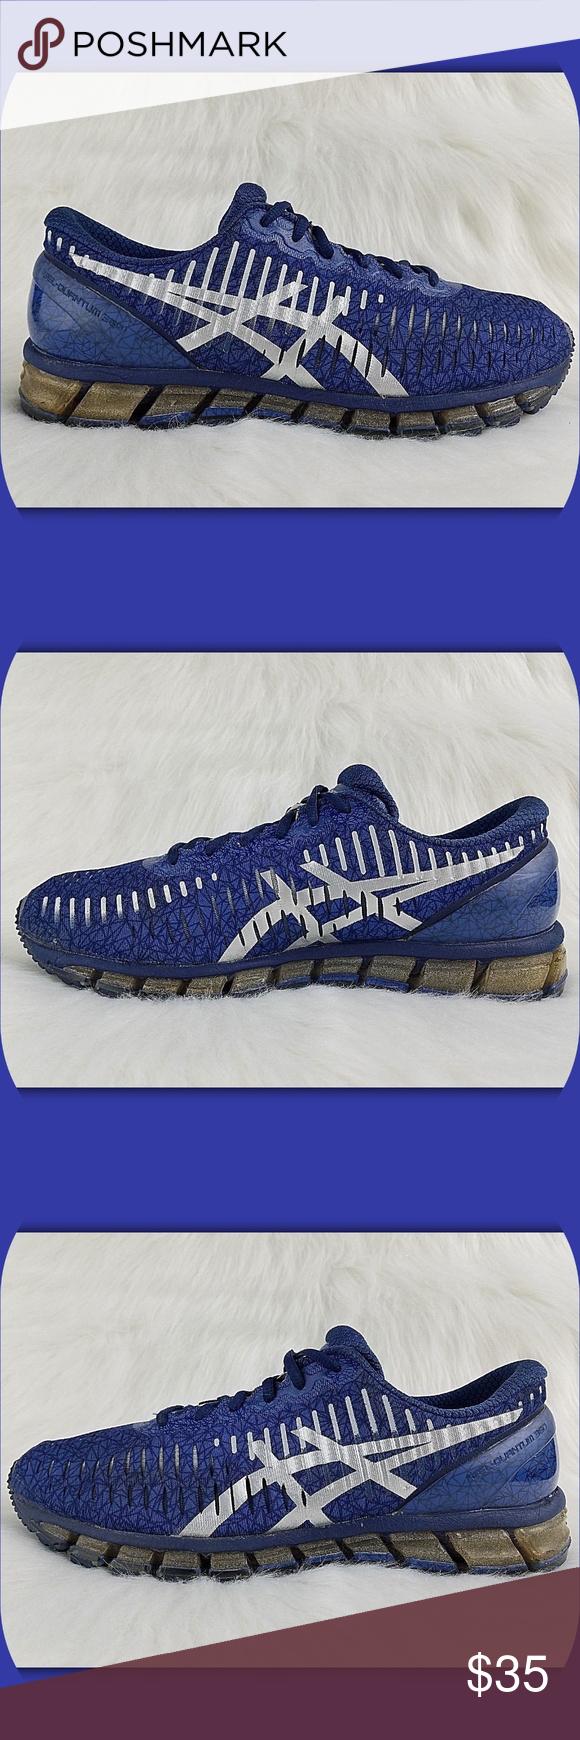 save off 1a032 f8bfb ASICS Gel Quantum 360 Athletic Running Shoes ASICS MEN'S ...